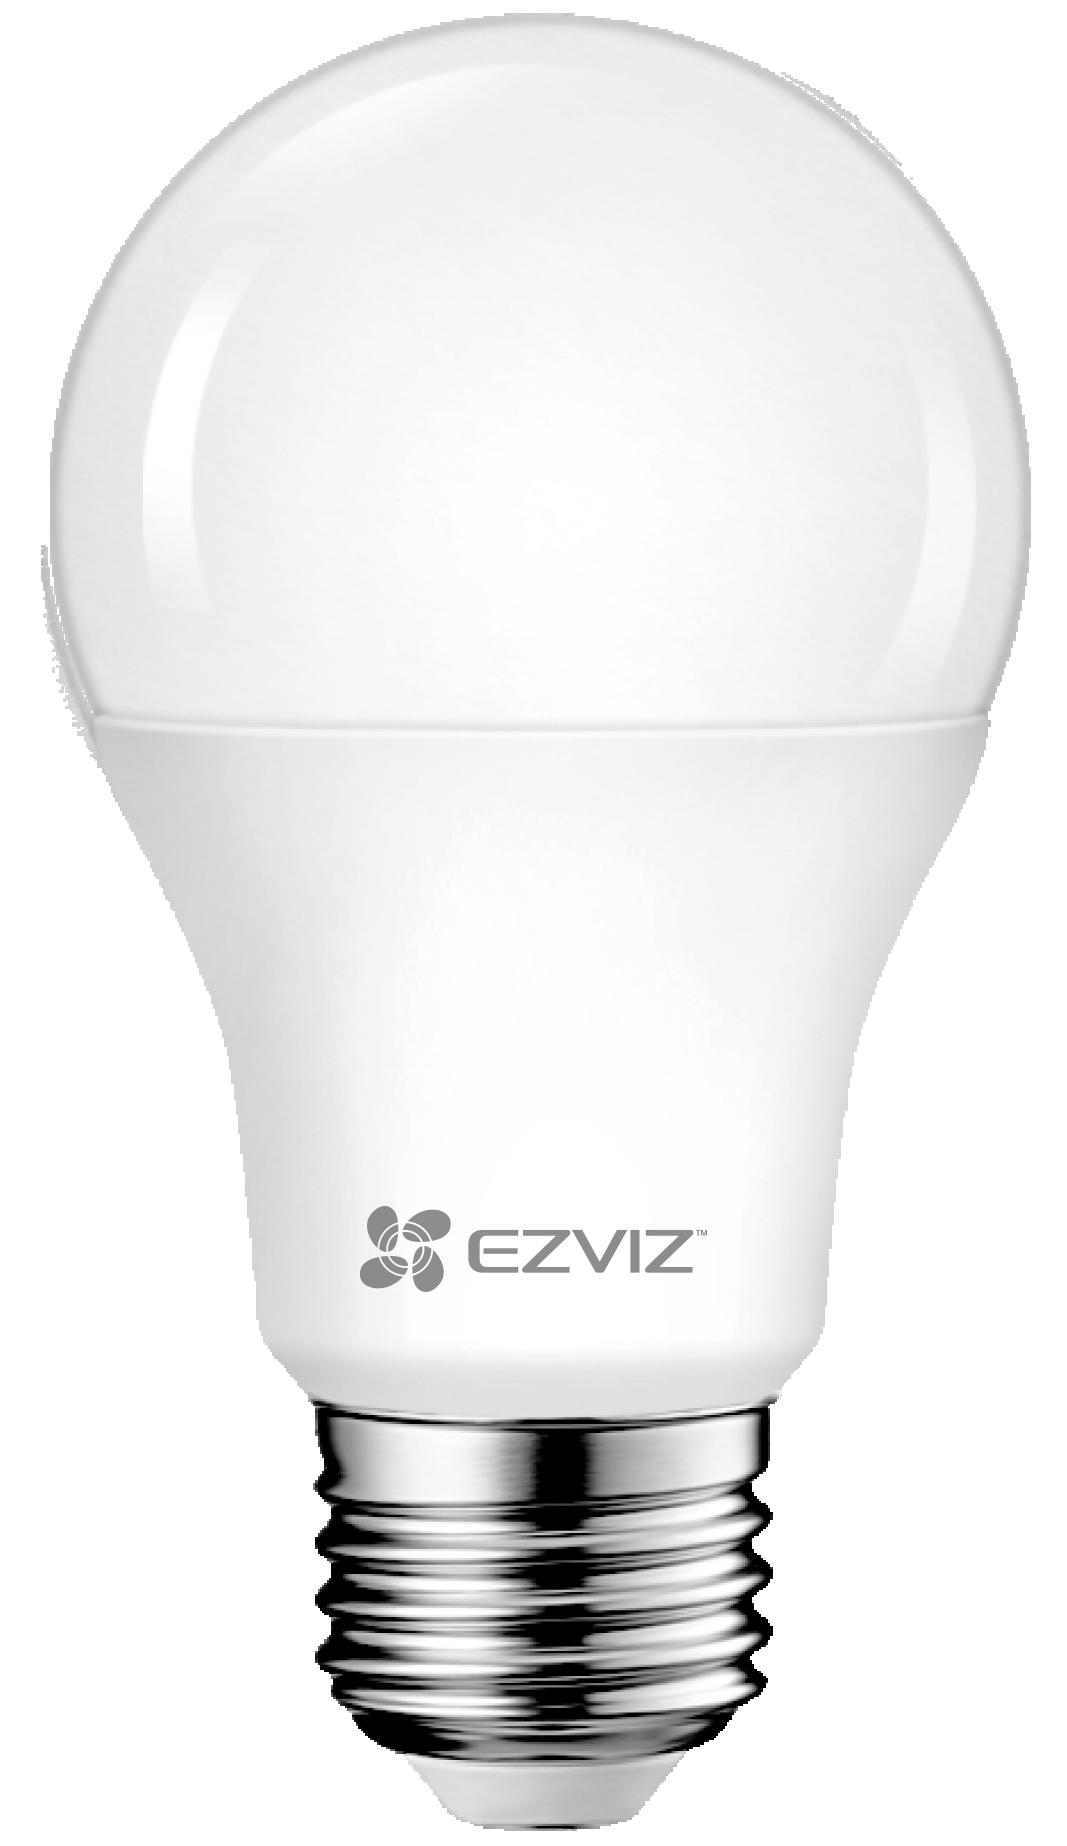 EZVIZ LB1 (White) - CS-HAL-LB1-LWAW